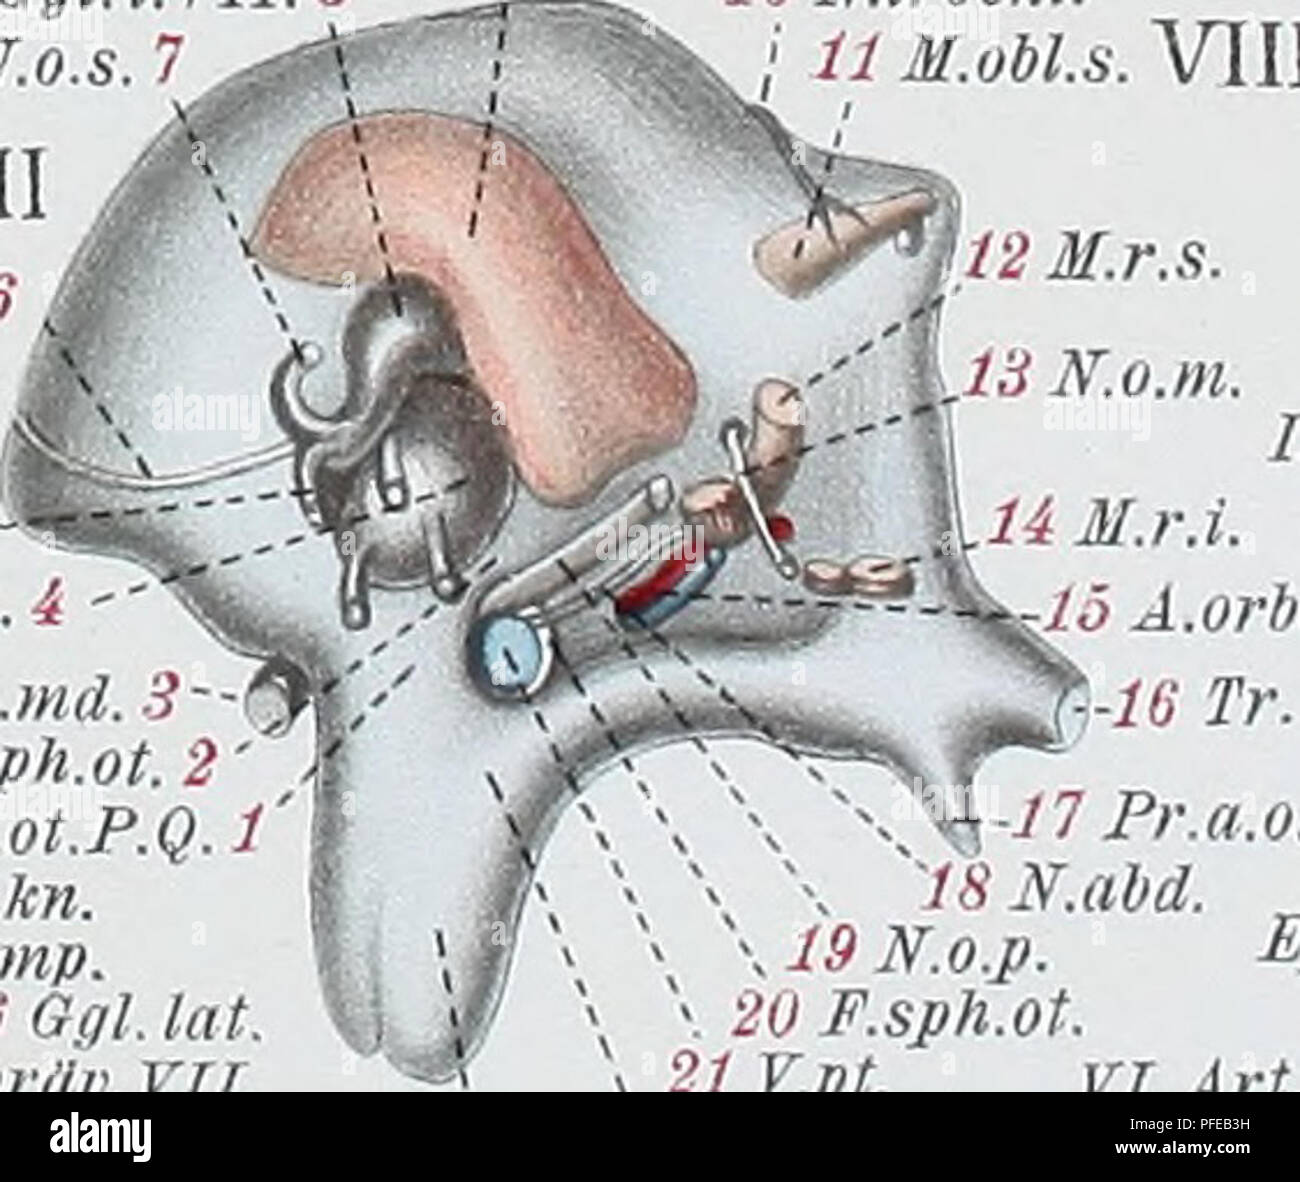 R 32 Stock Photos Images Page 3 Alamy Humbucker Wiring Diagram Obl Denkschriften Der Medicinisch Naturwissenschaftlichen Gesellschaft Zu Jena 20 F